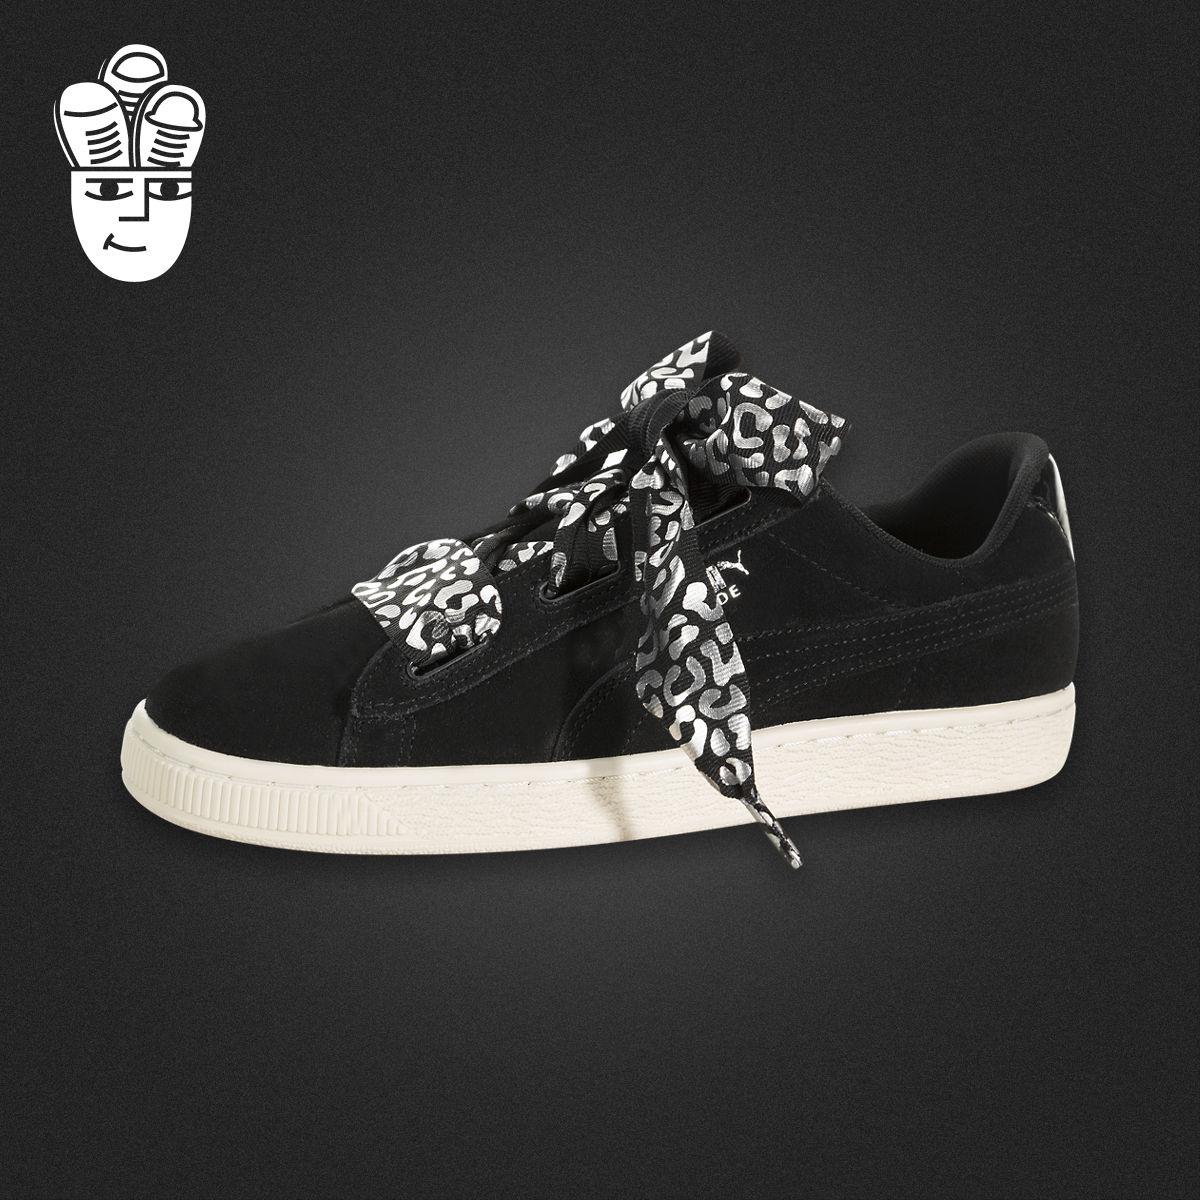 Puma Suede Heart Ath Luxe彪马女鞋 时尚潮流板鞋 舒适休闲鞋